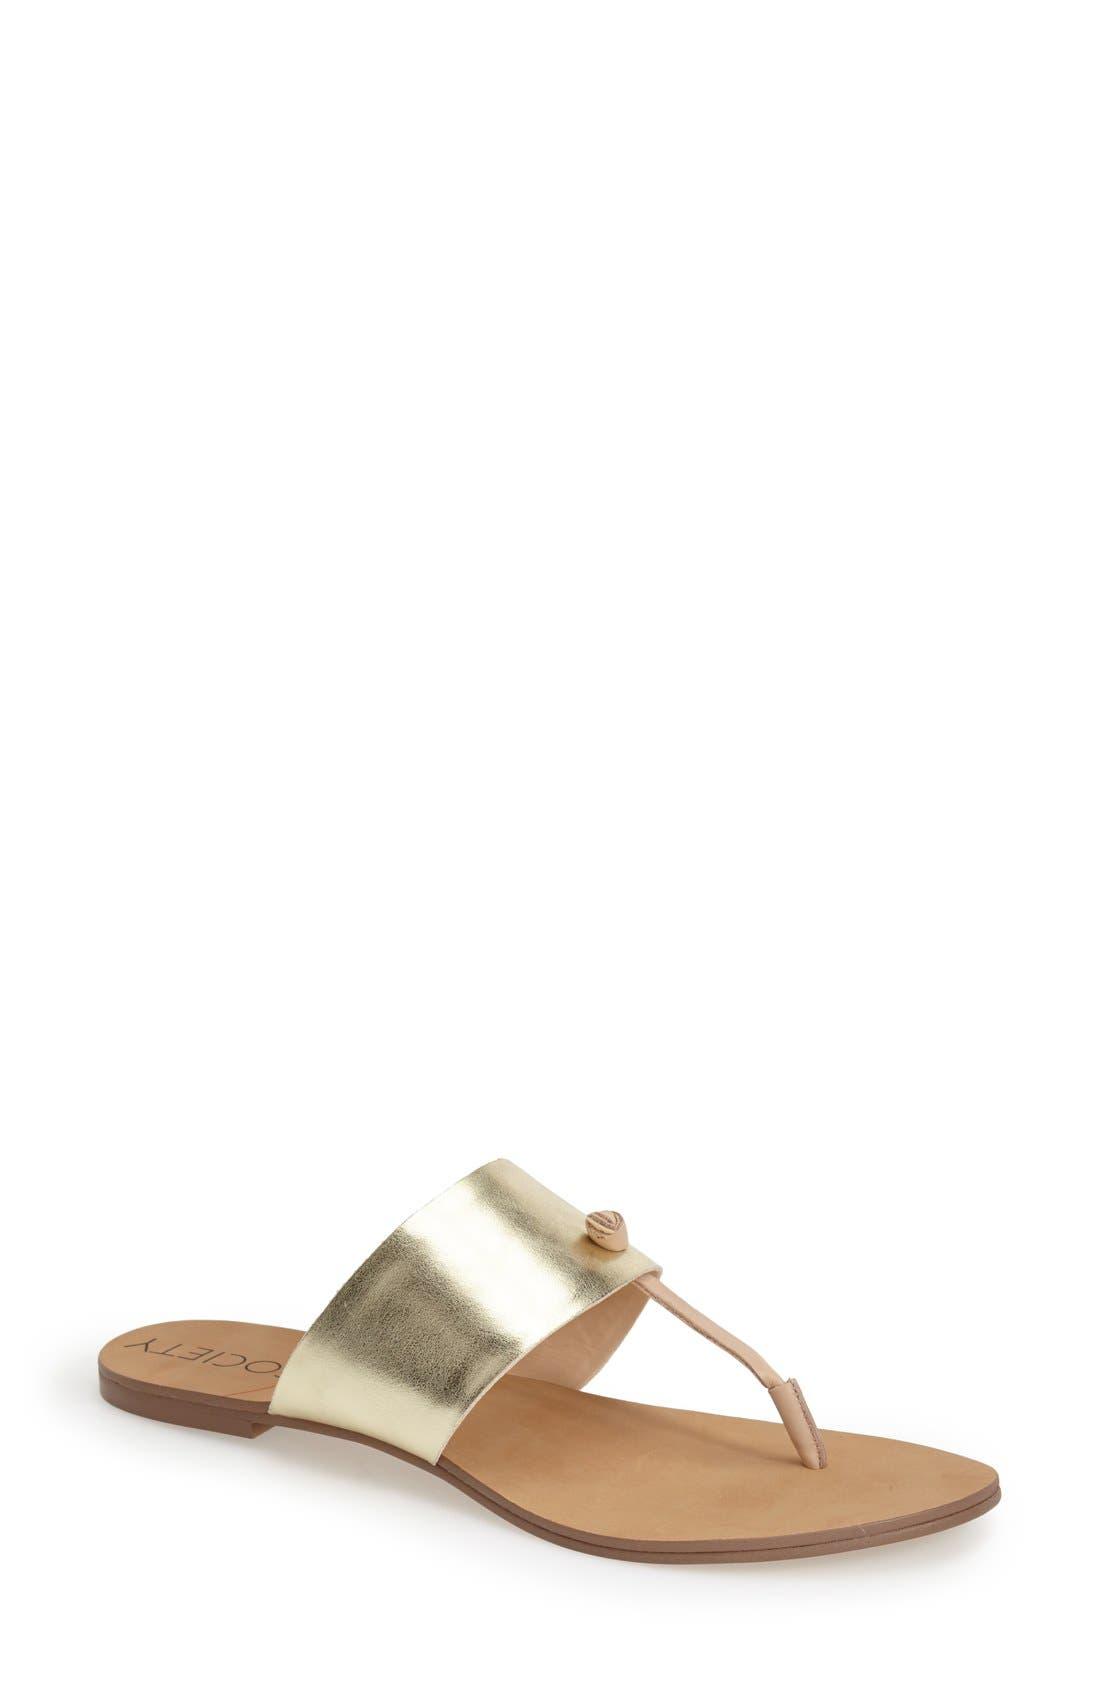 Main Image - Sole Society 'Sarena' Thong Sandal (Women)